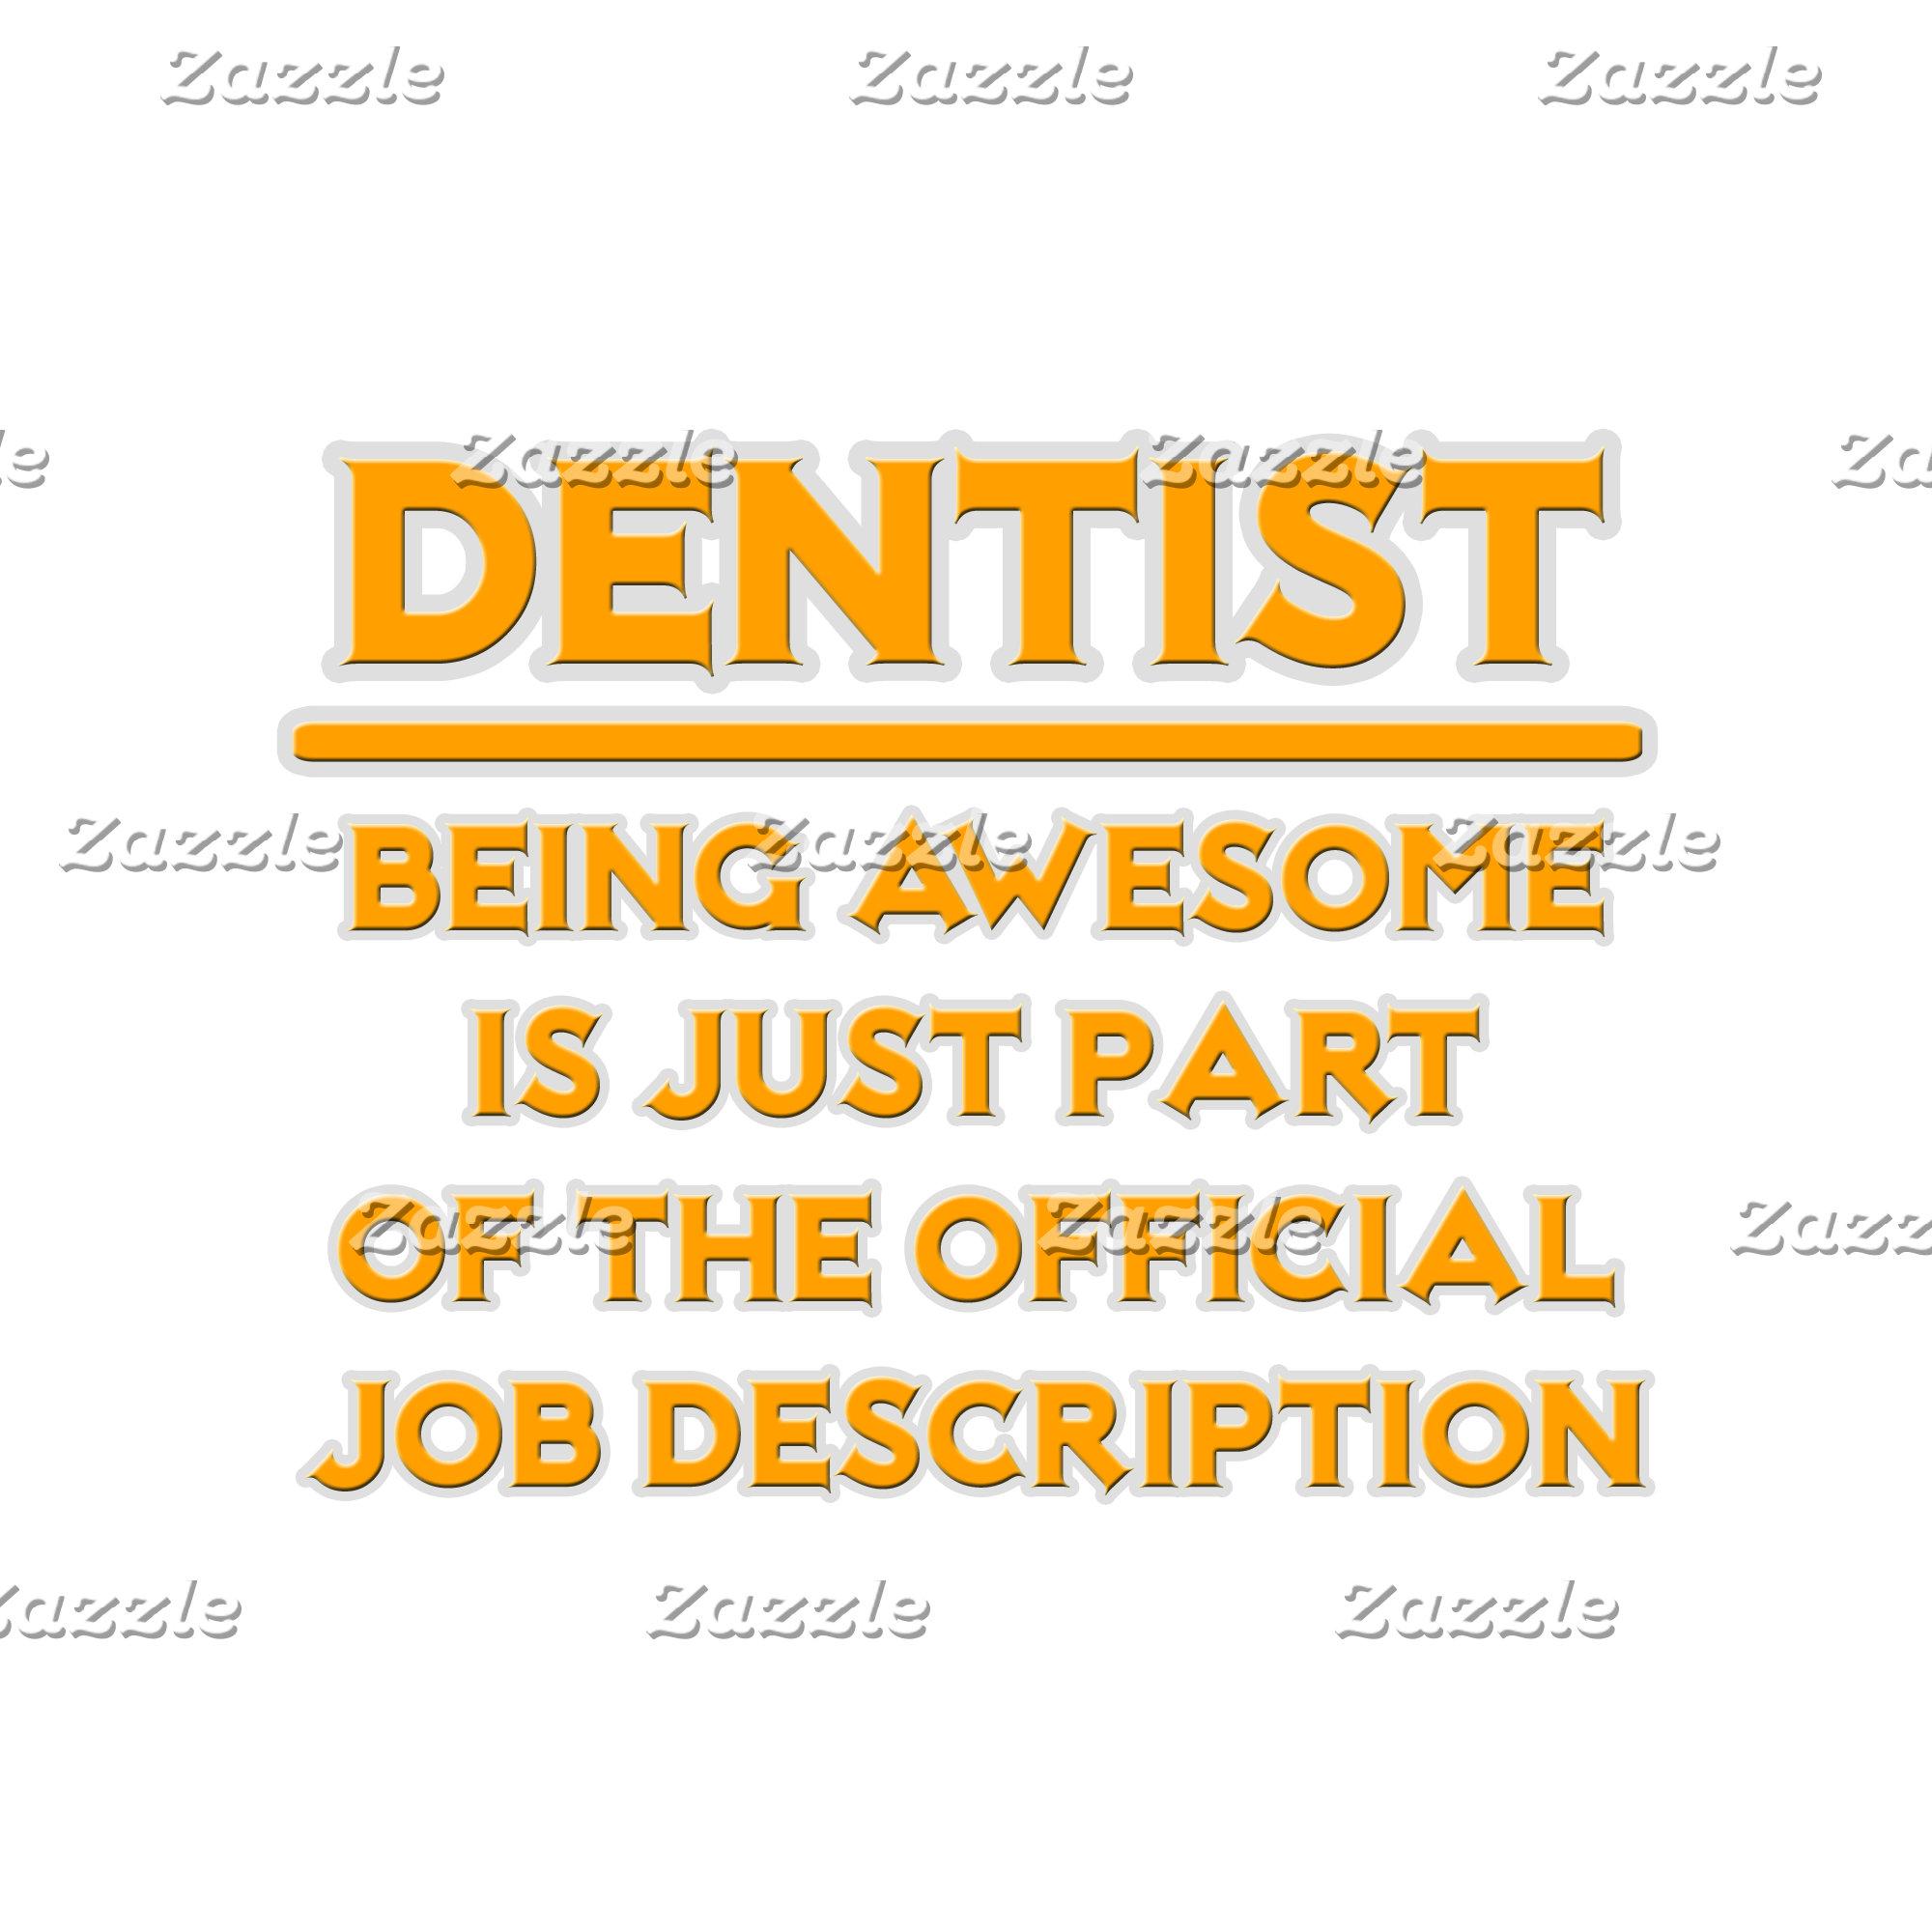 Awesome Dentist .. Official Job Description